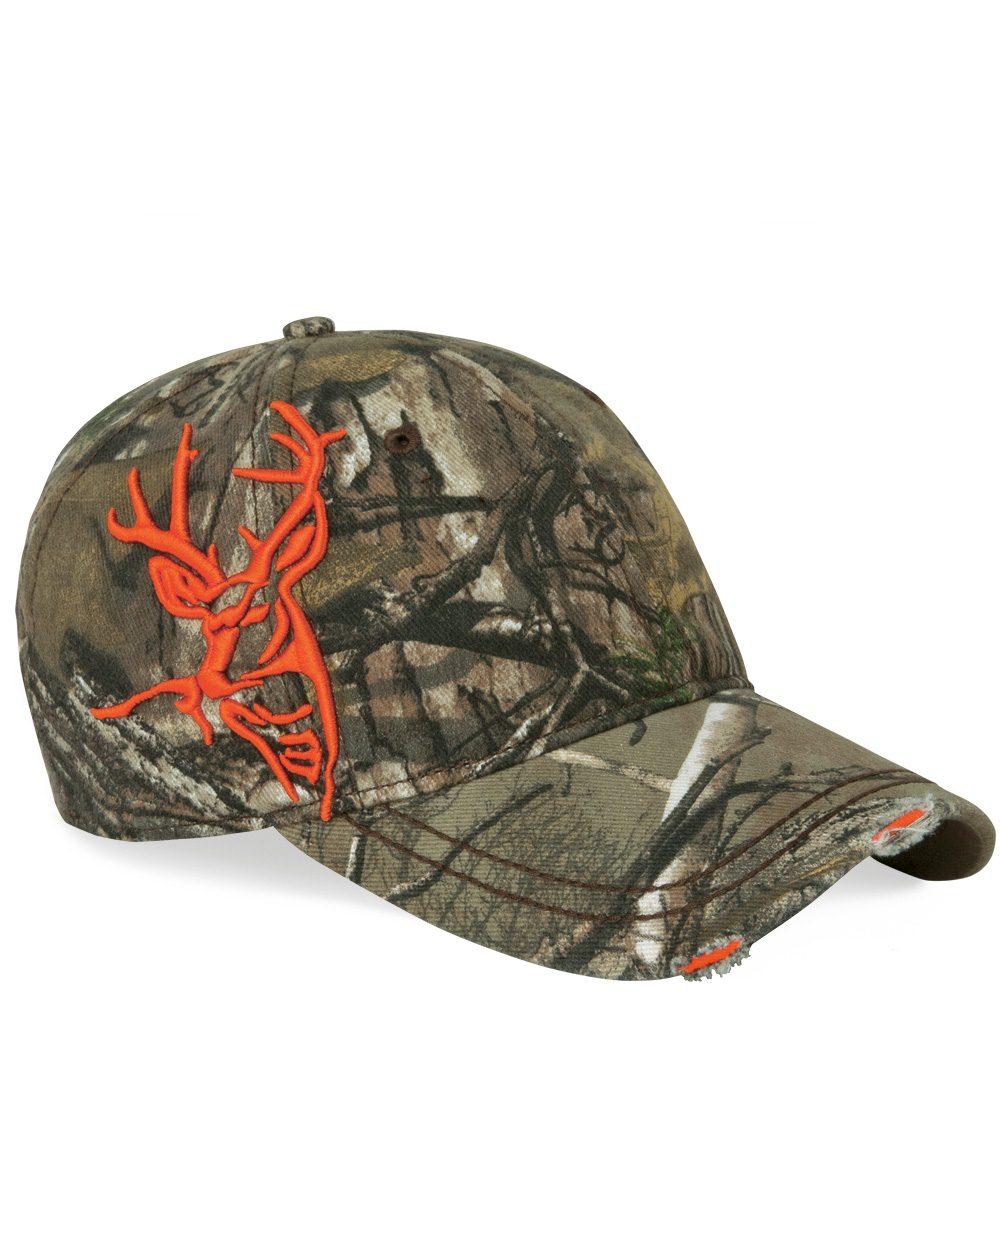 DRI DUCK 3307 - 3D Buck Cap